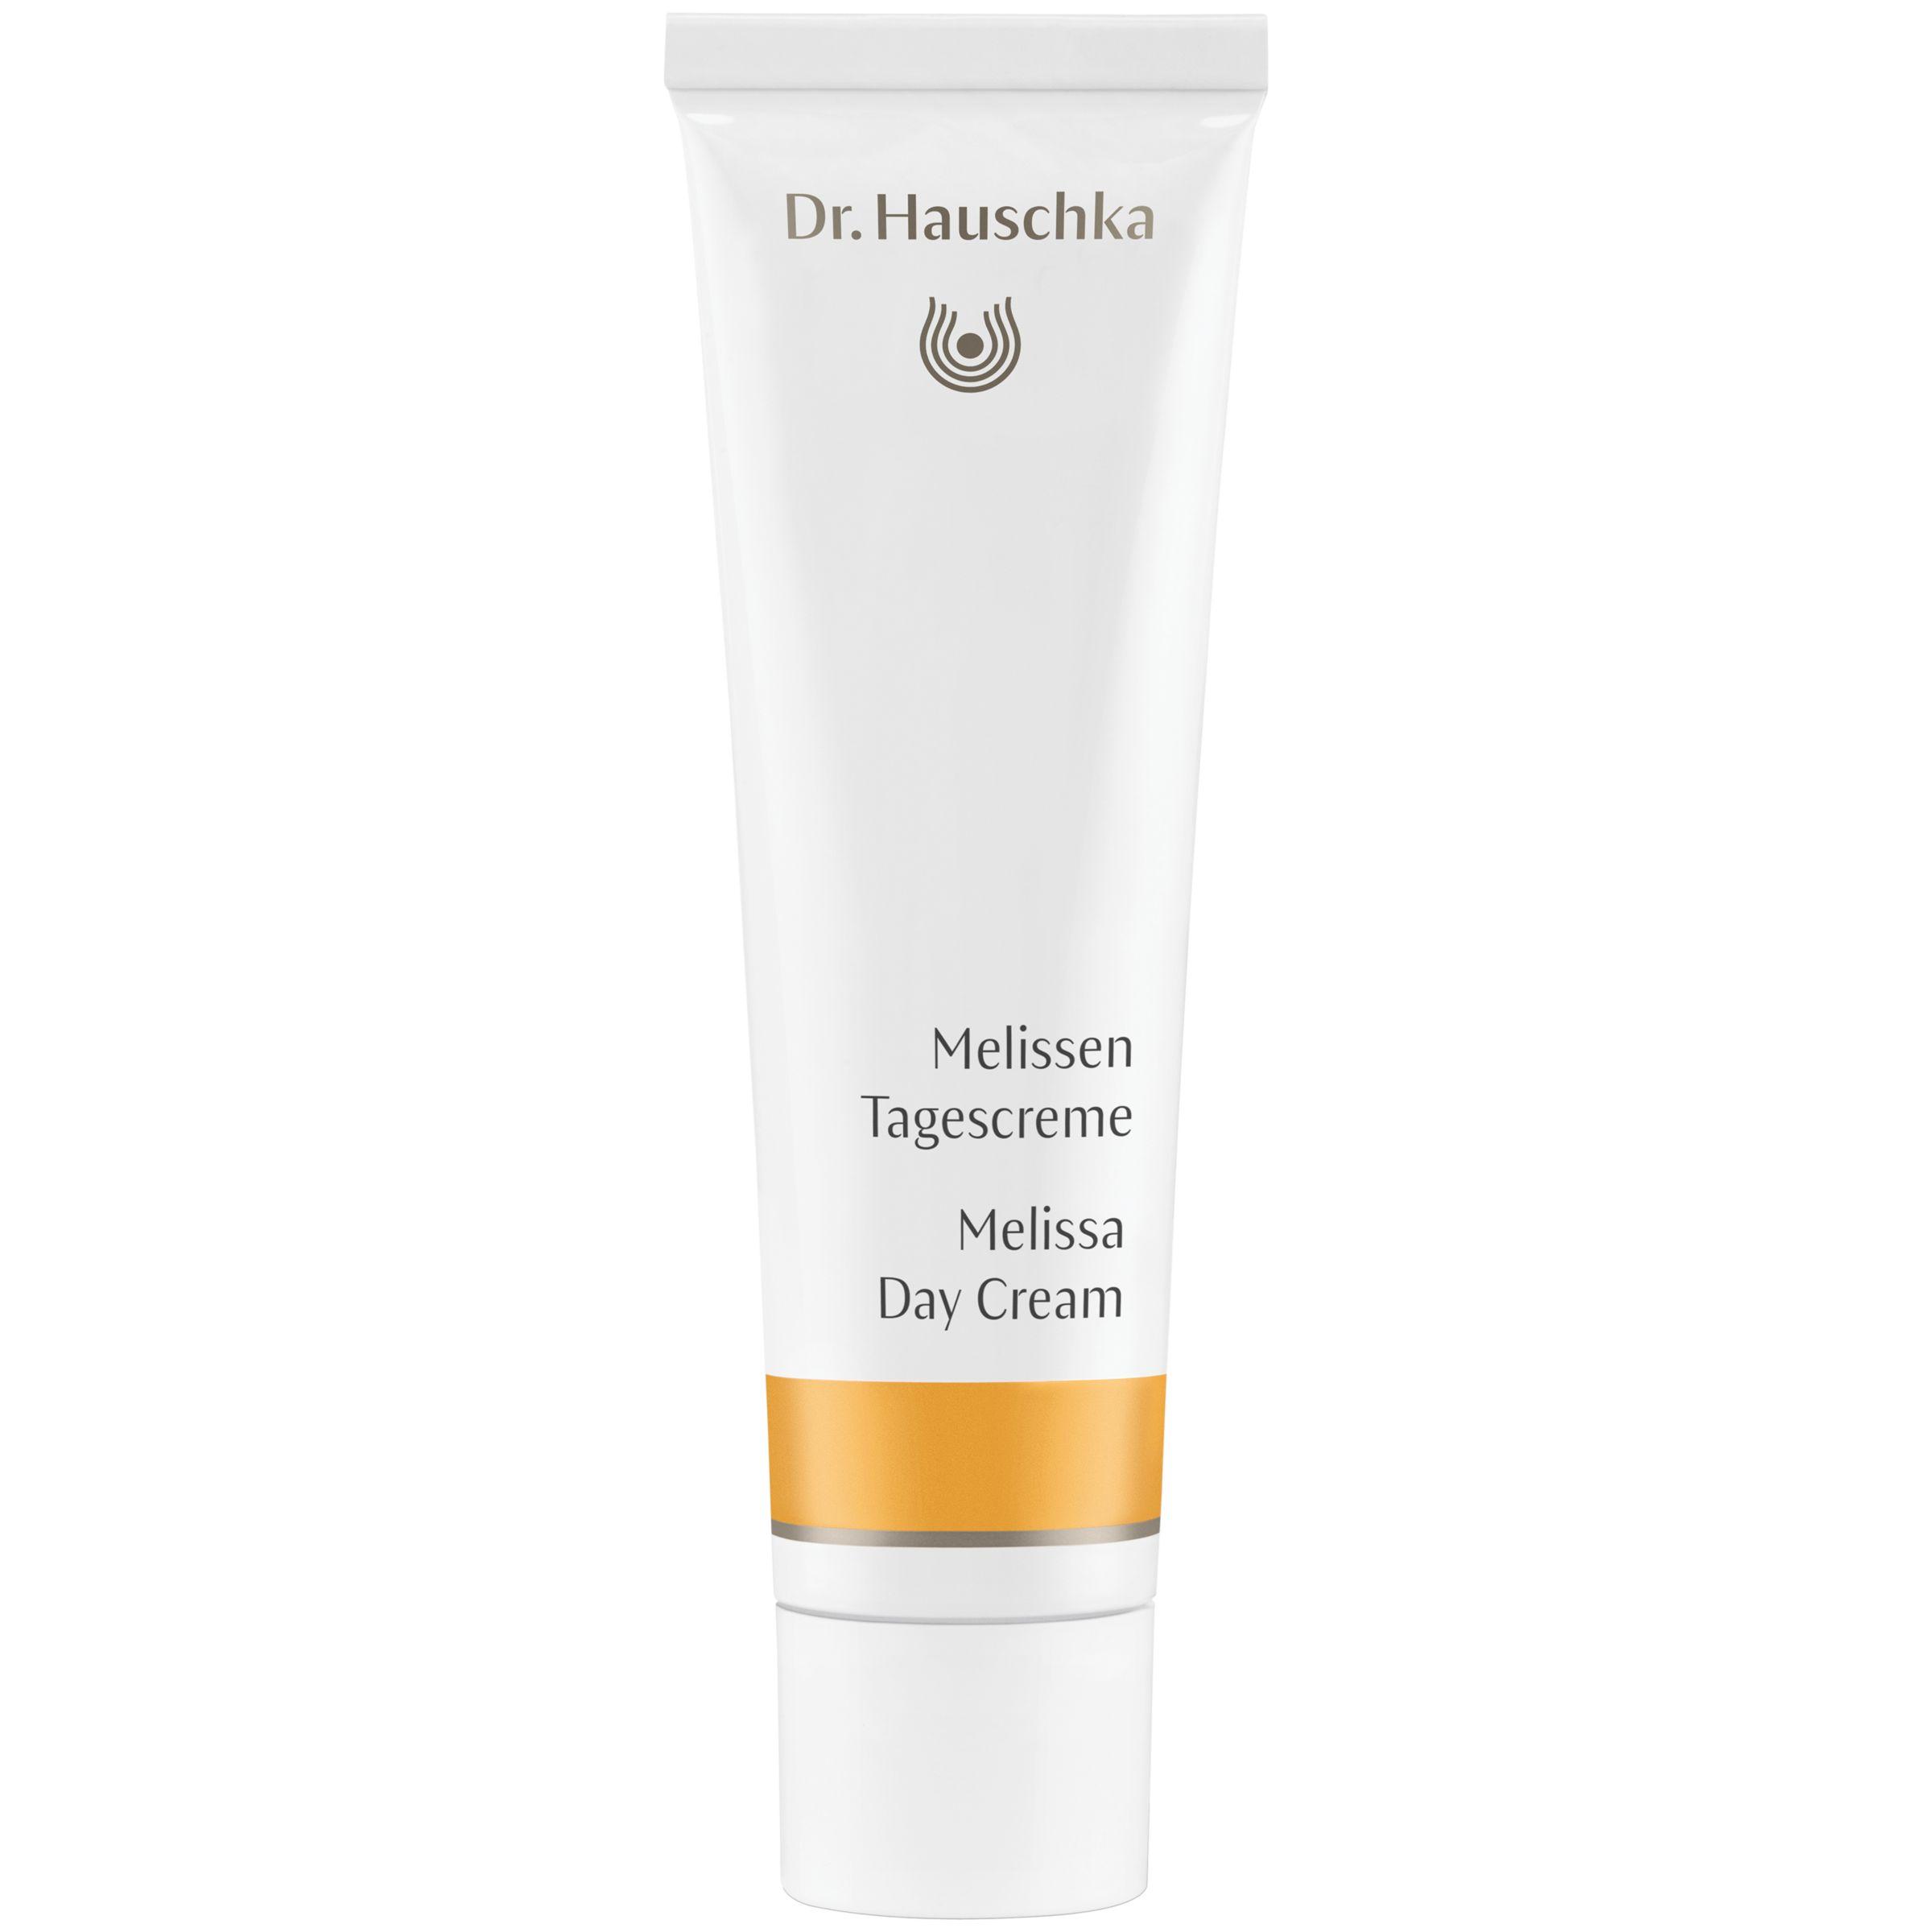 Dr Hauschka Dr Hauschka Melissa Day Cream, 30ml